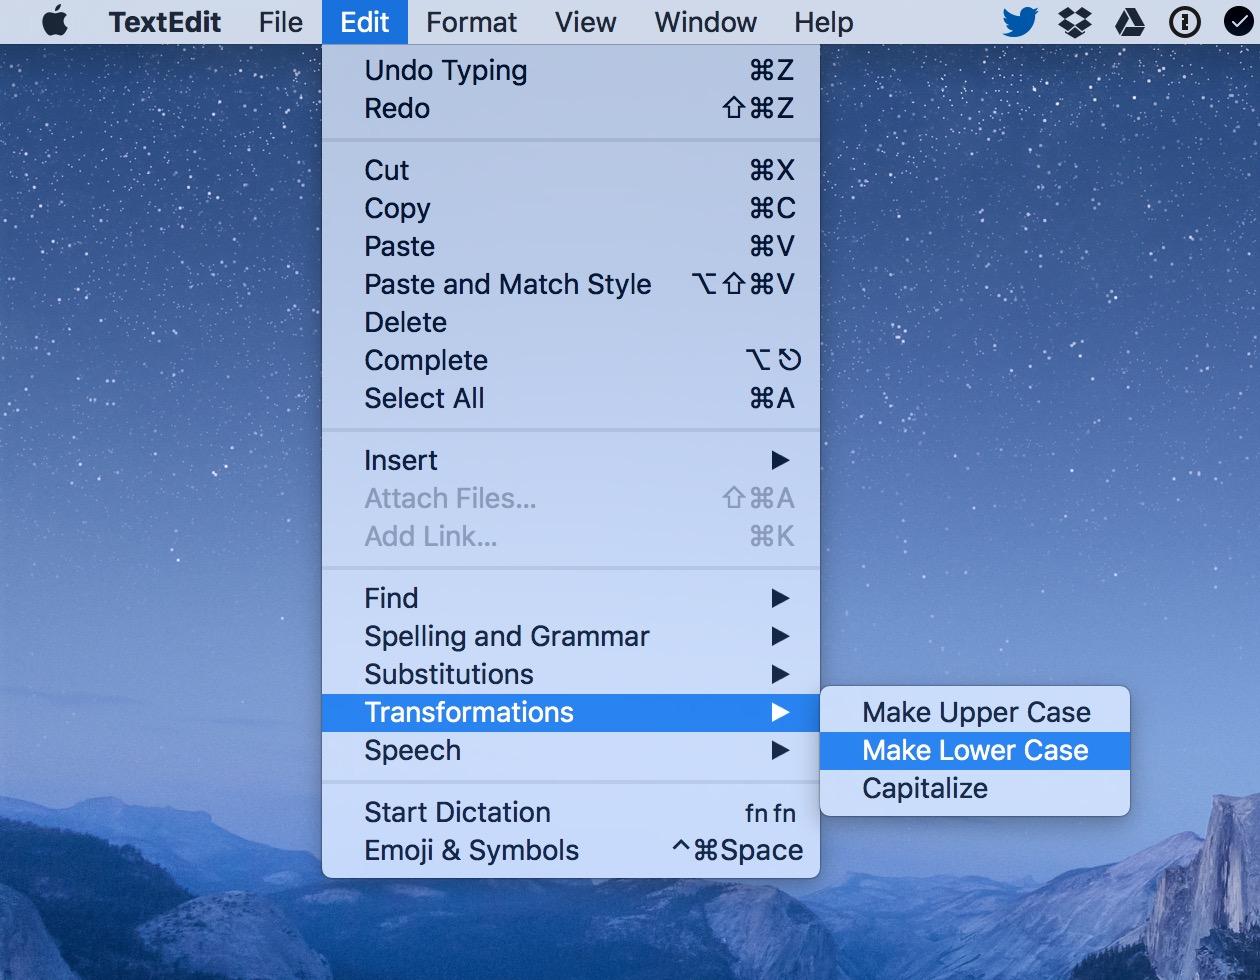 macOS Edit Transformations menu option in TextEdit